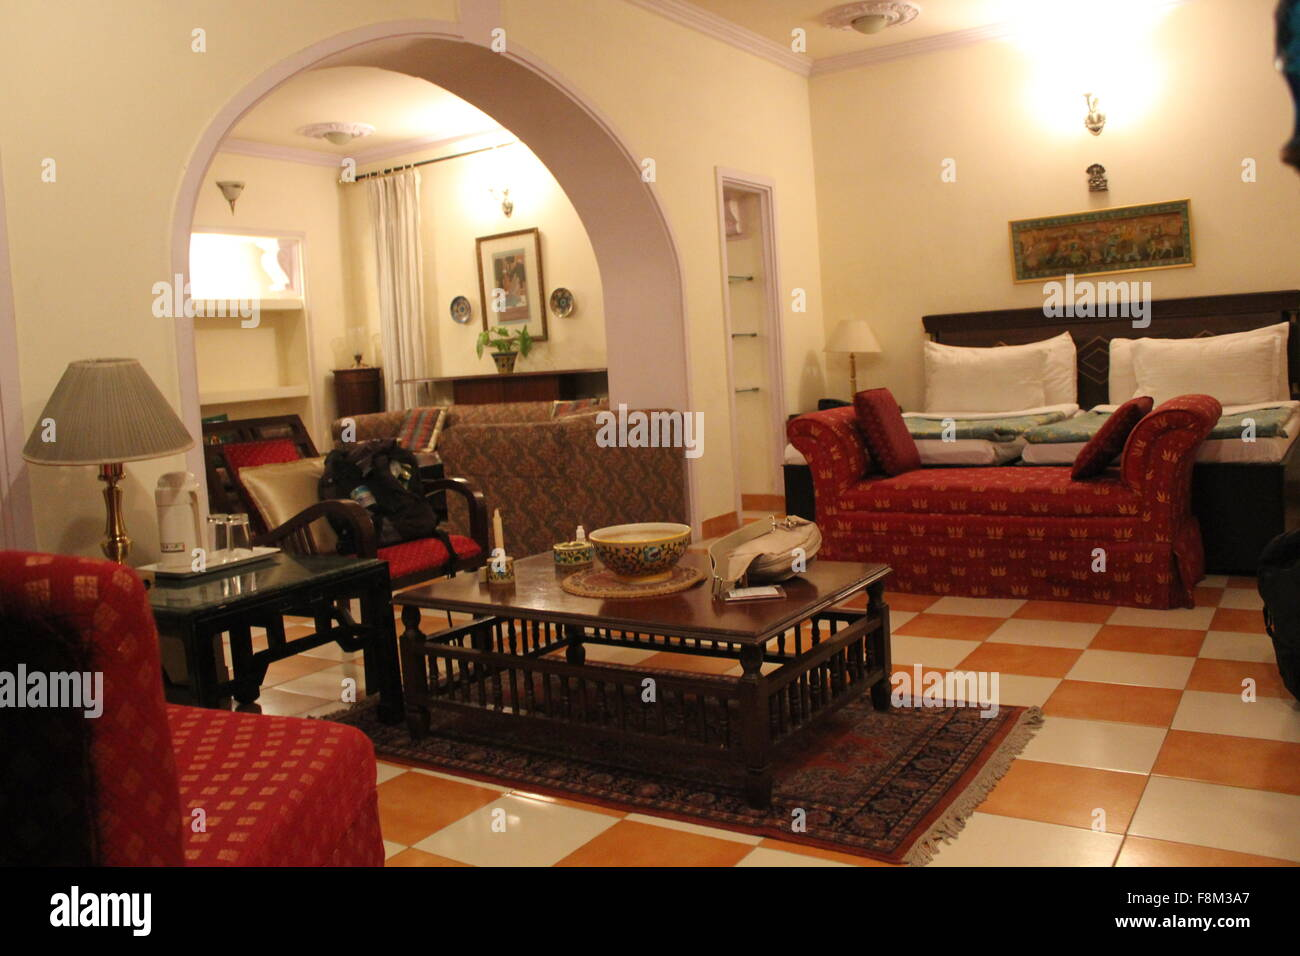 agra inde 26 nov hospitalit indienne traditionnelle chambre dans un hotel agra le 26. Black Bedroom Furniture Sets. Home Design Ideas